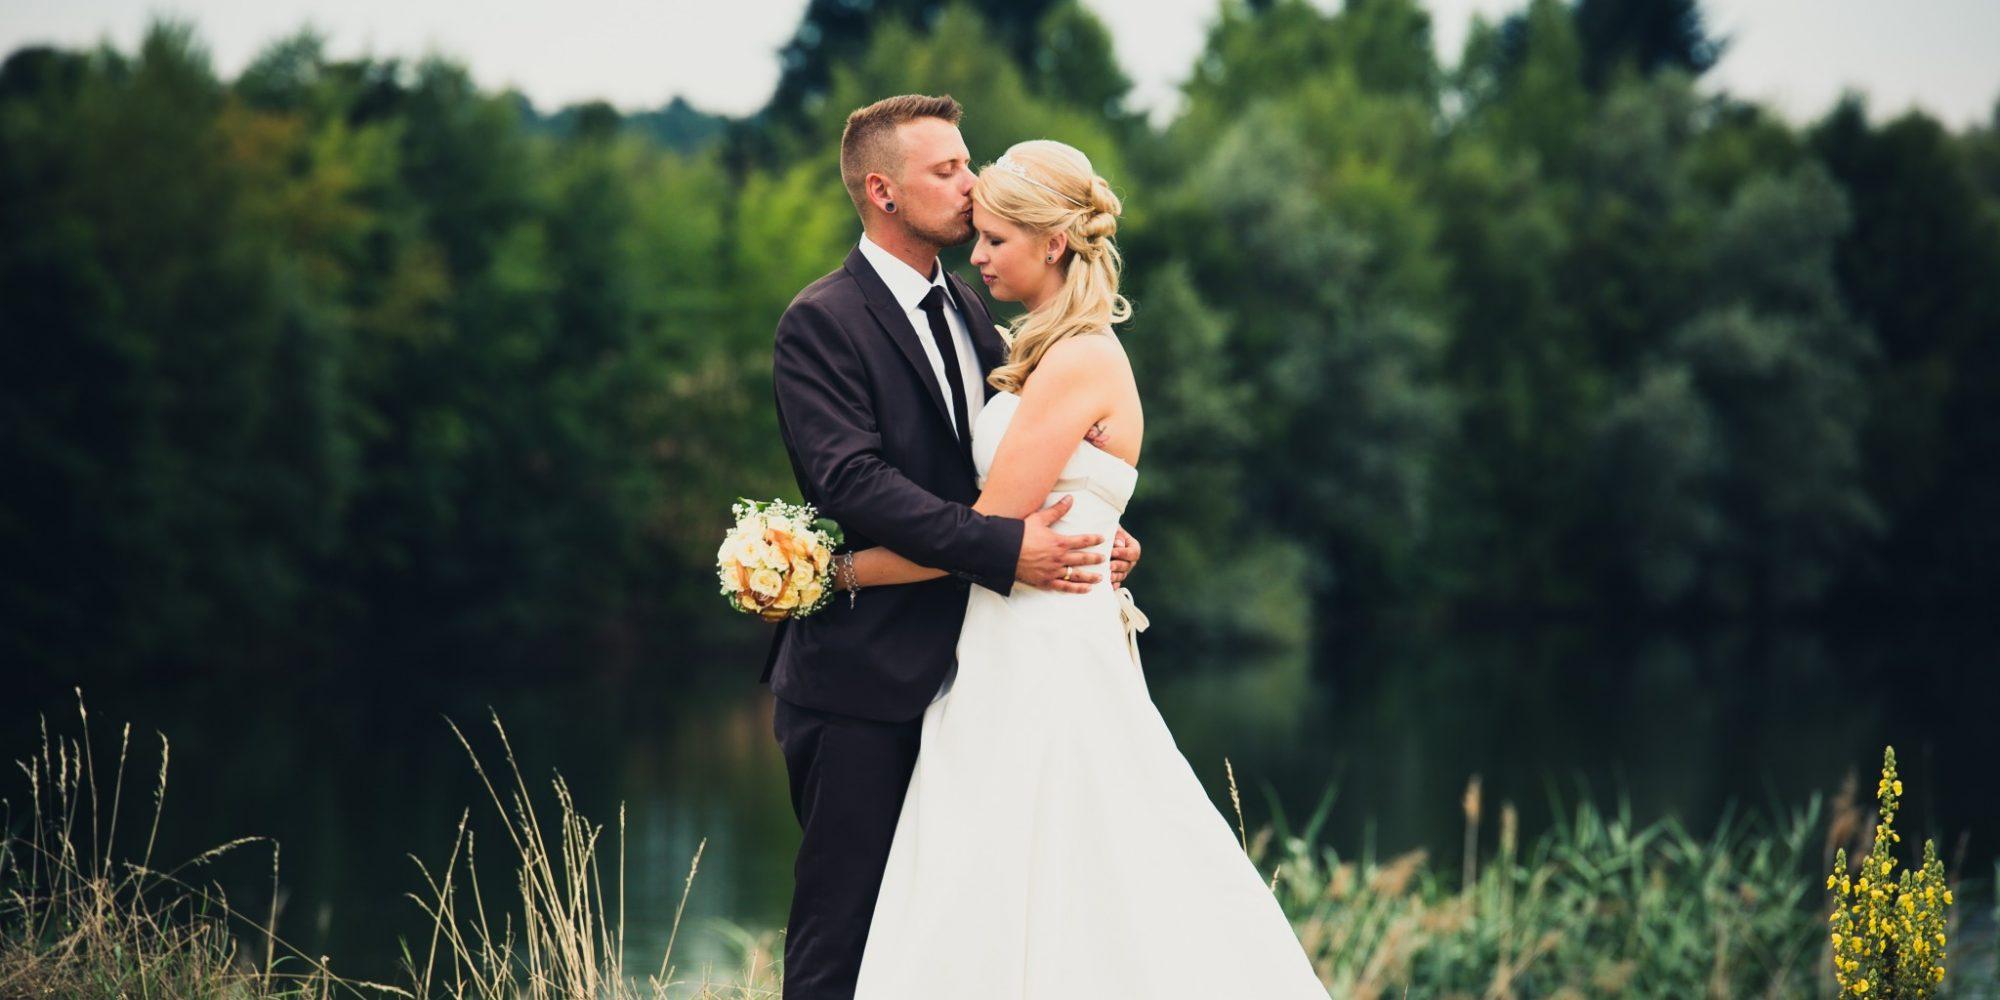 Hochzeitsfotograf Kahl am Main